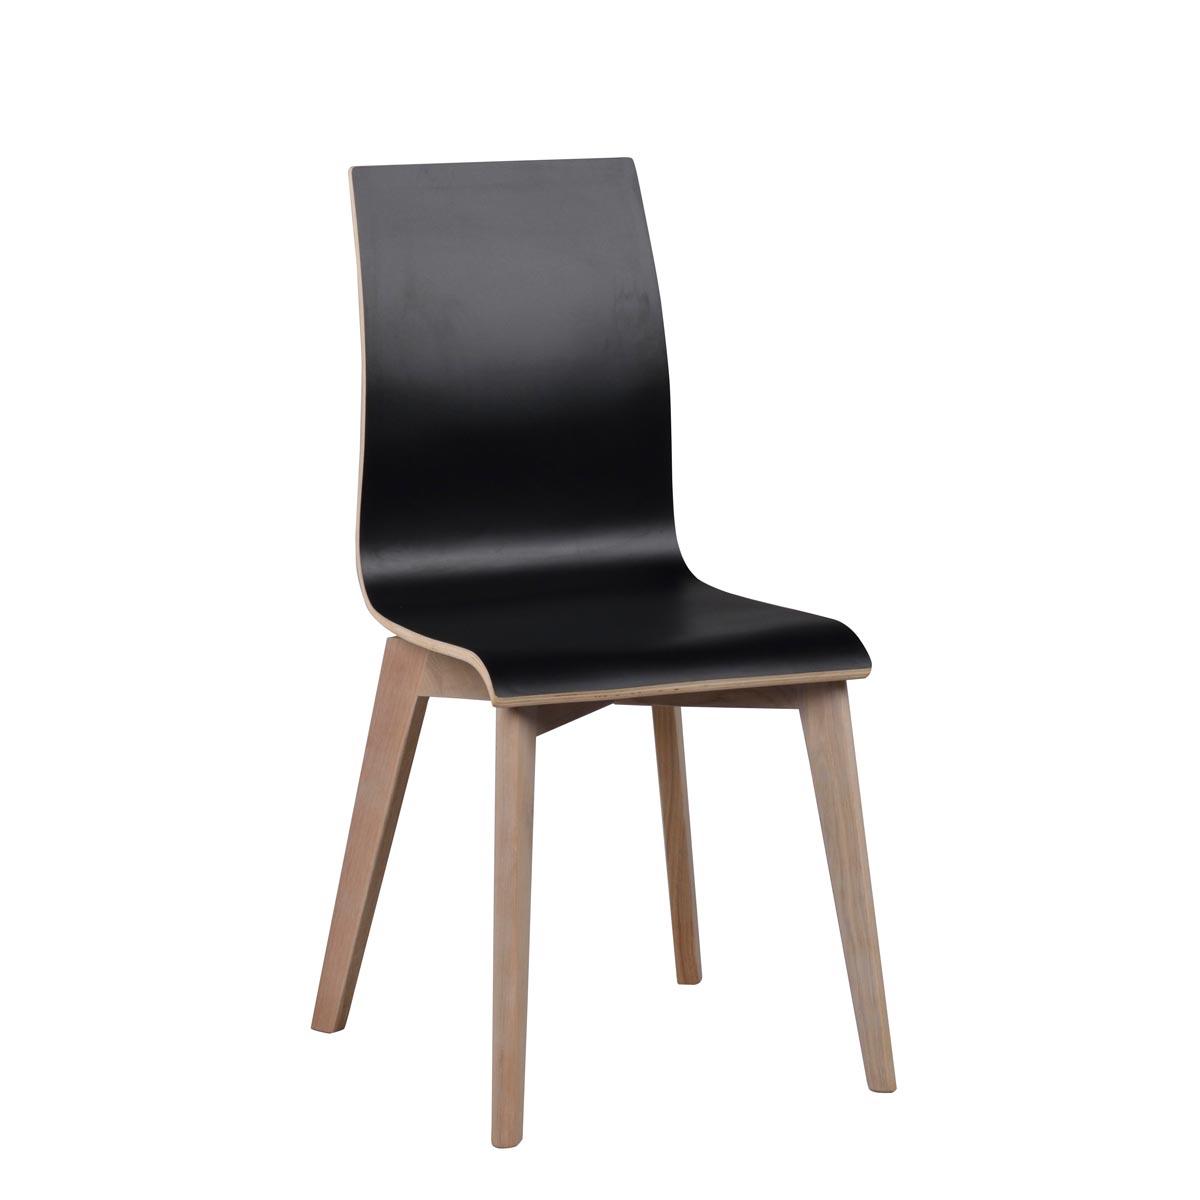 Febe-stol-svart-laminat-w-Grace-113632